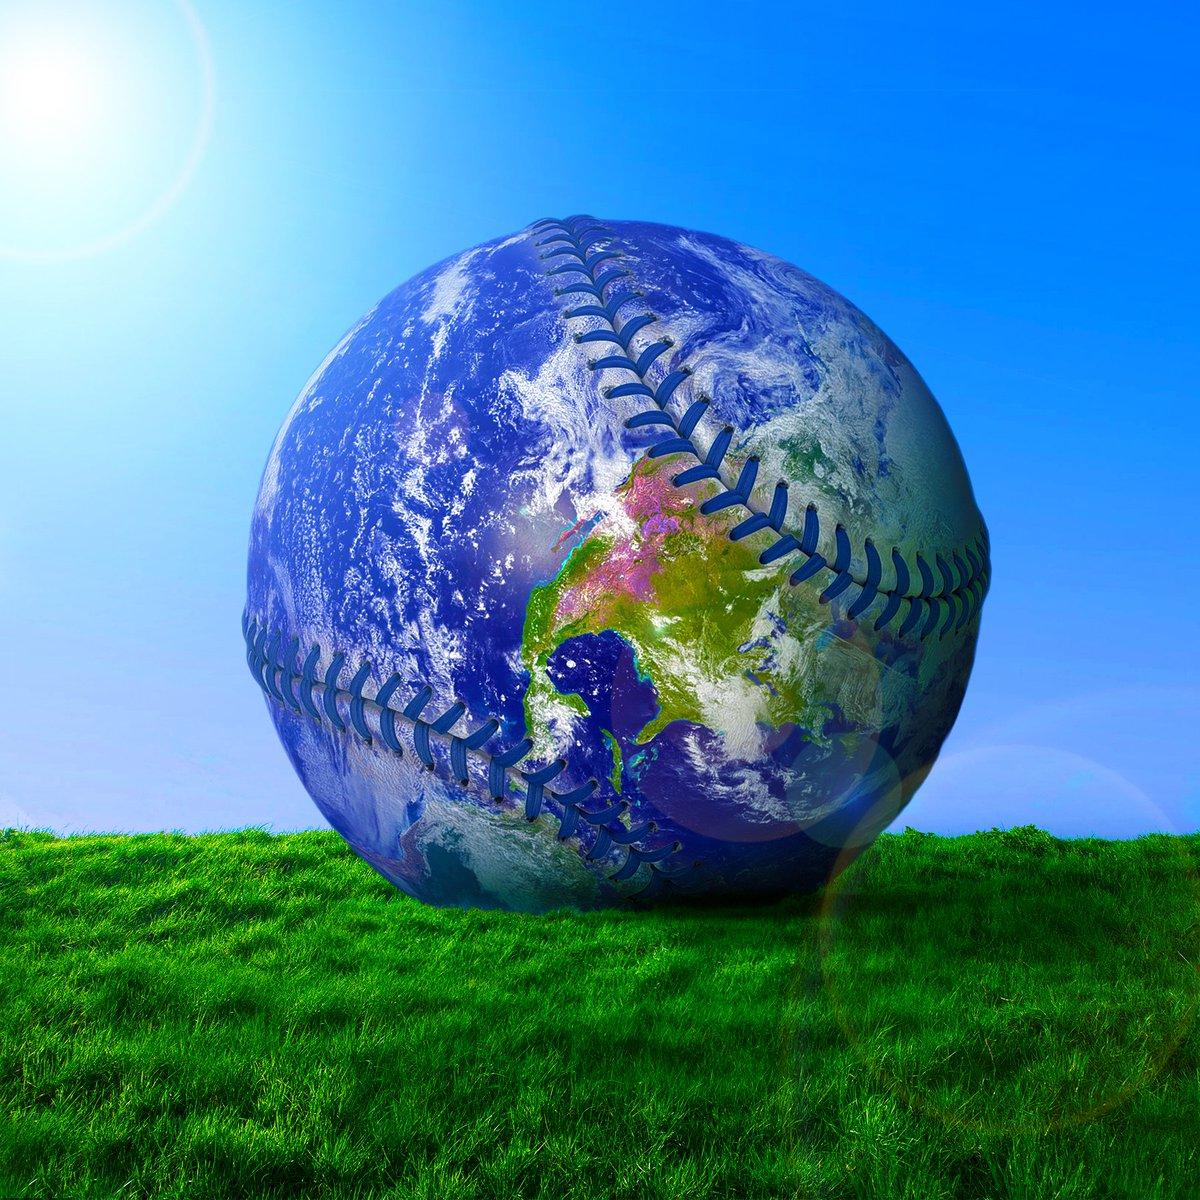 Happy #EarthDay from the greatest game on Earth. https://t.co/oDXwtvztXa